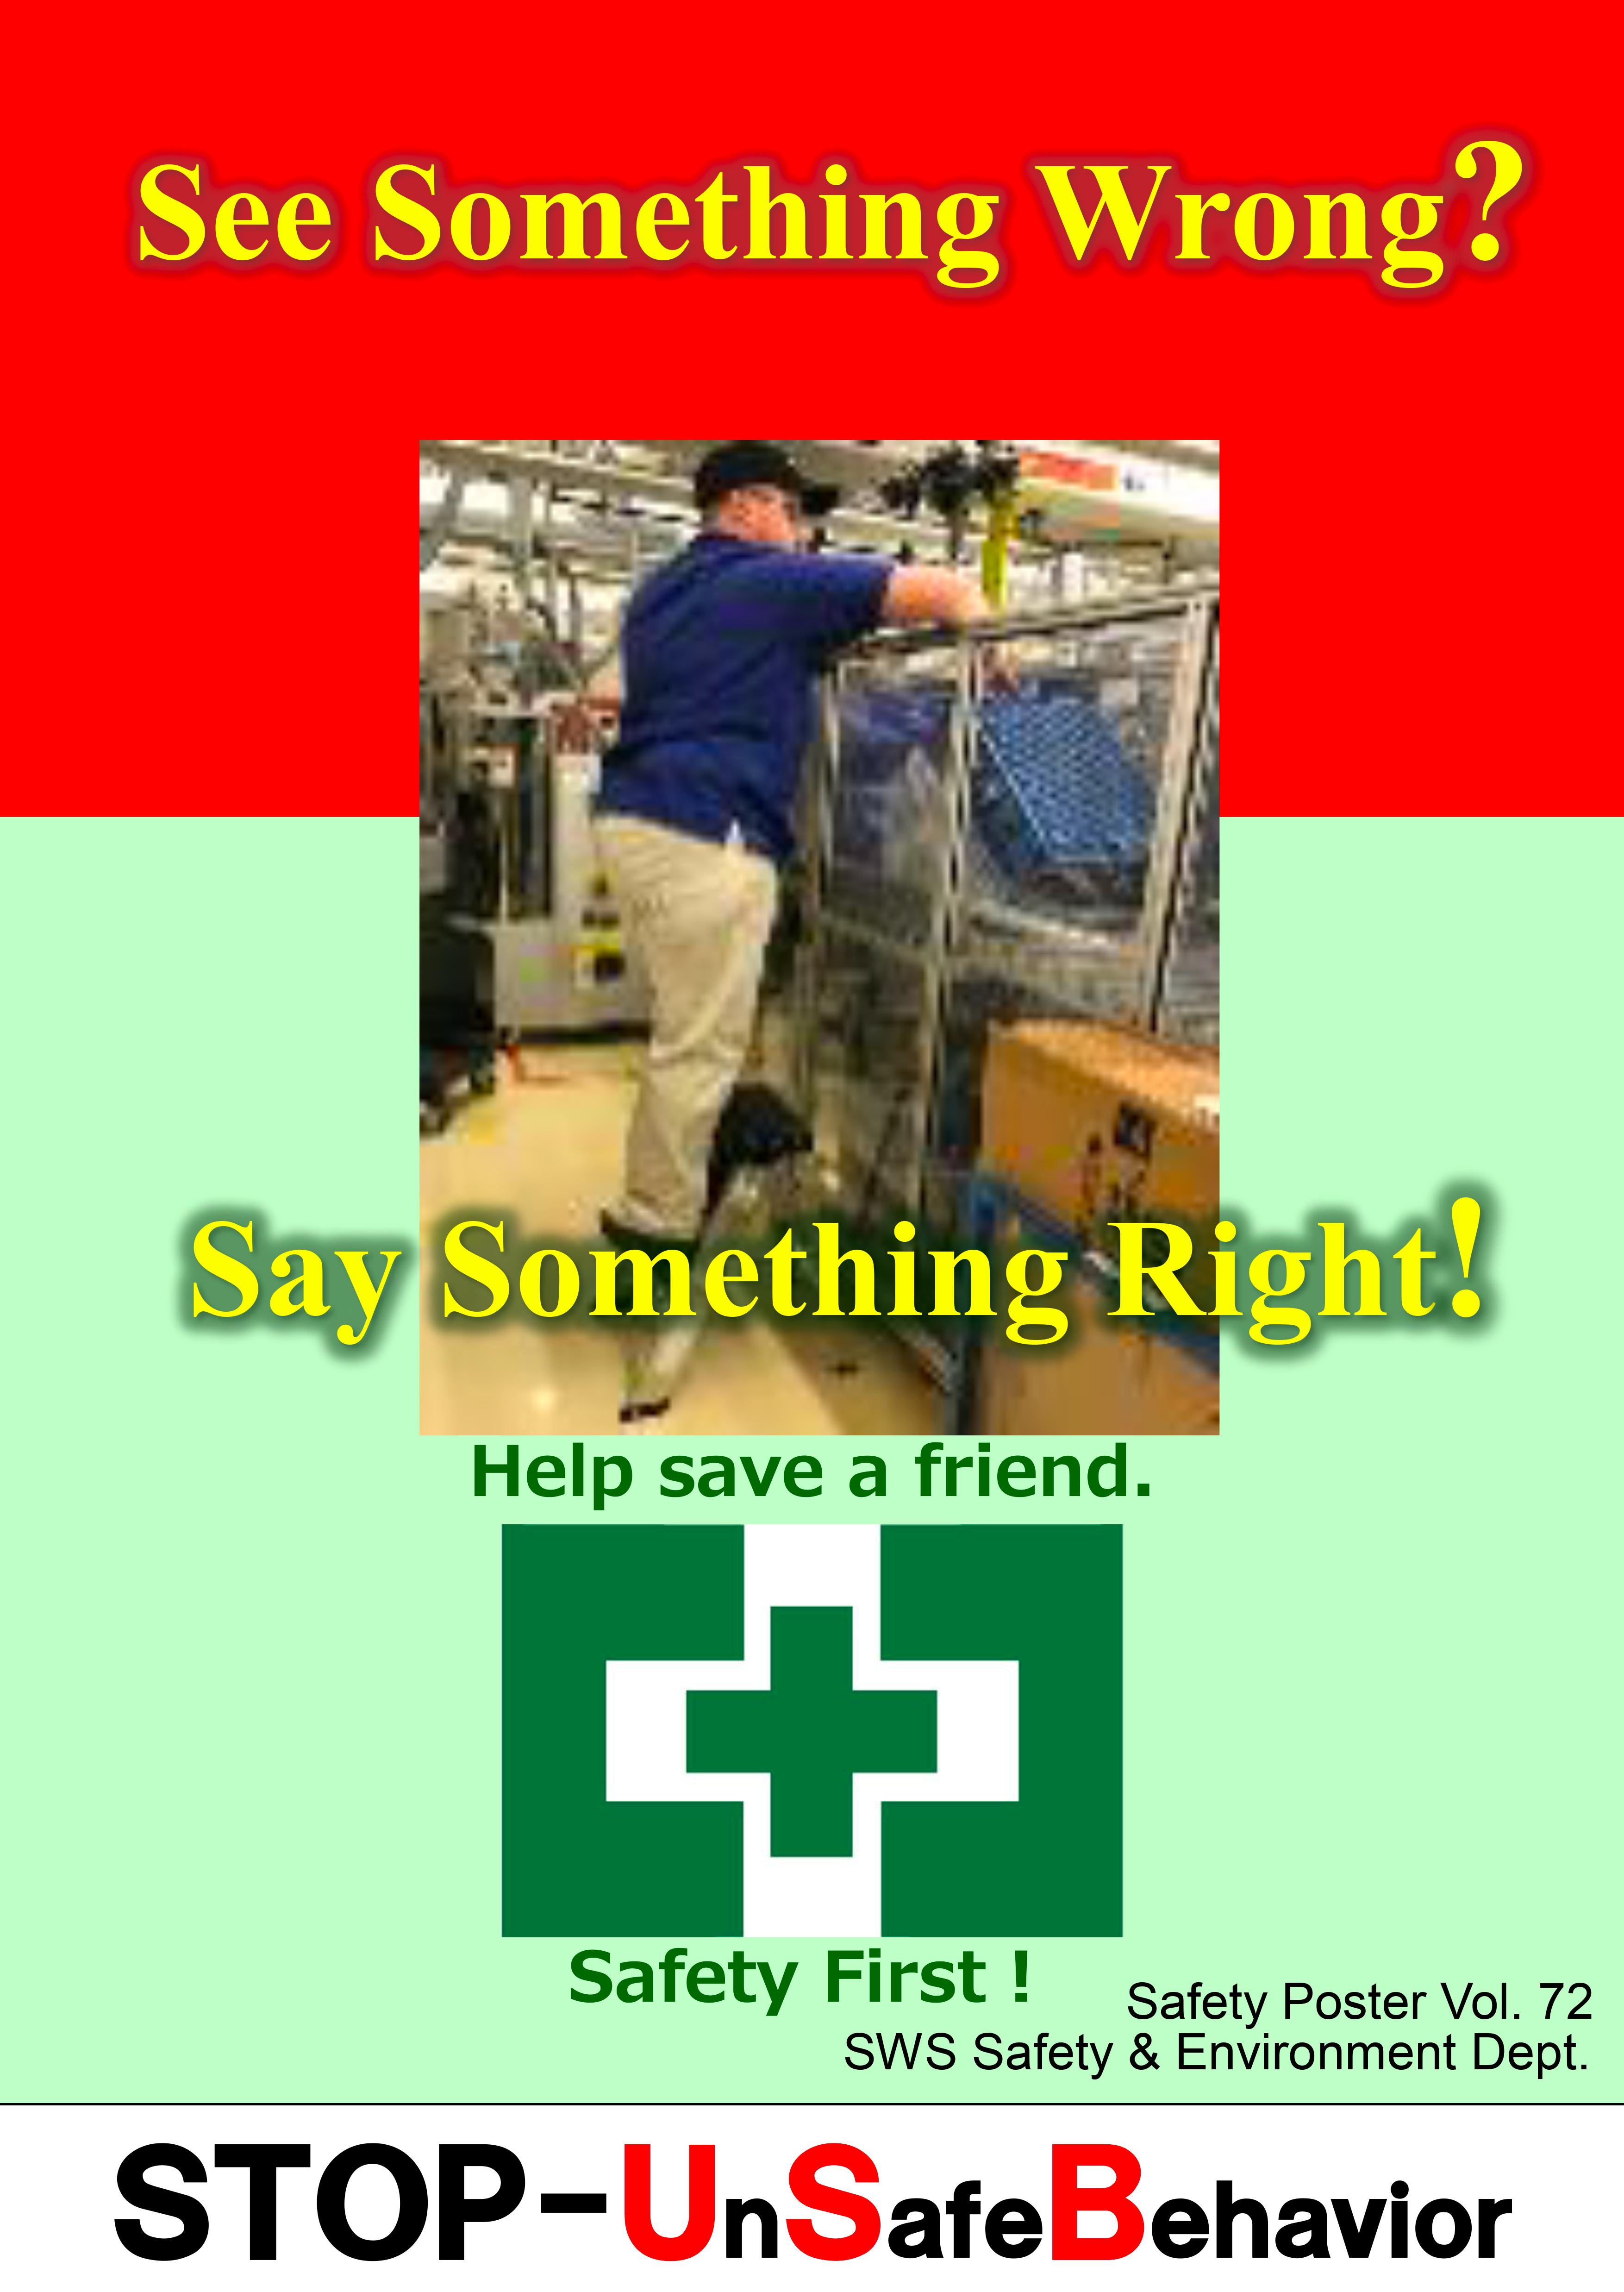 Sews Cabind Security bone fracture